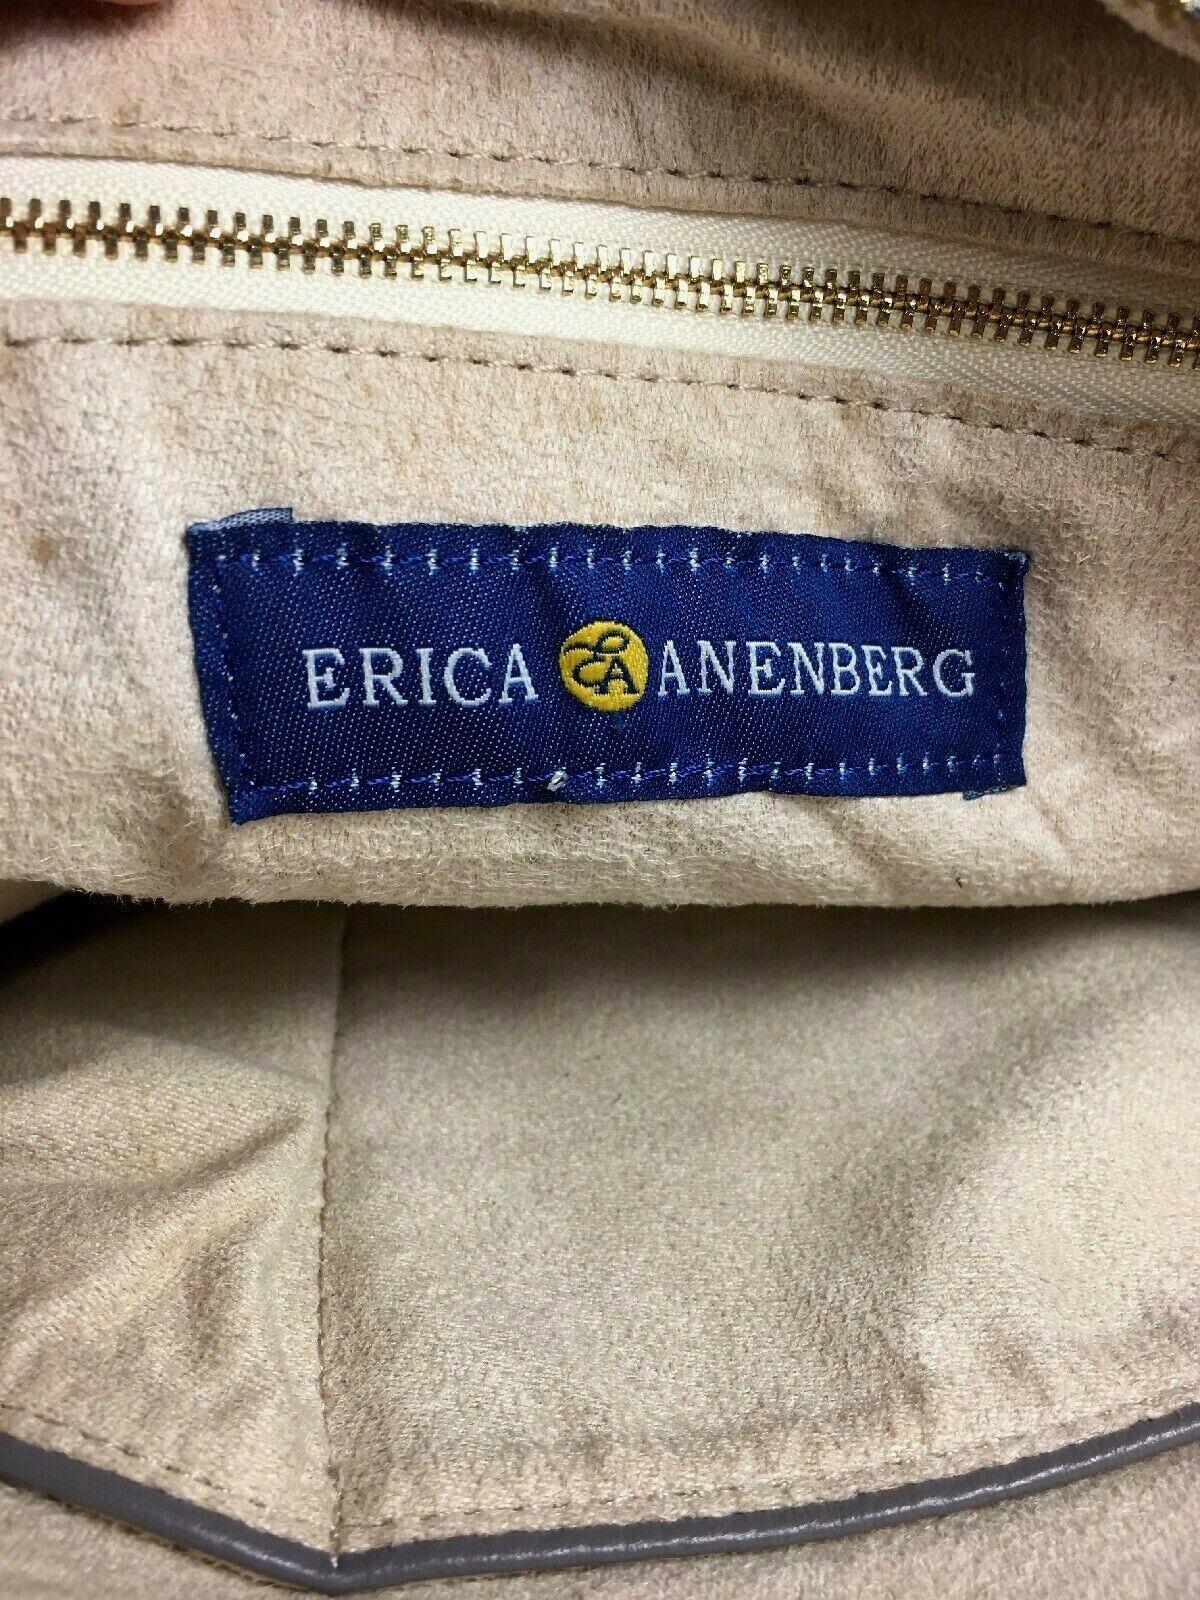 Erica Anenberg Grey Leather Cross Body Satchel Shoulder Bag image 12